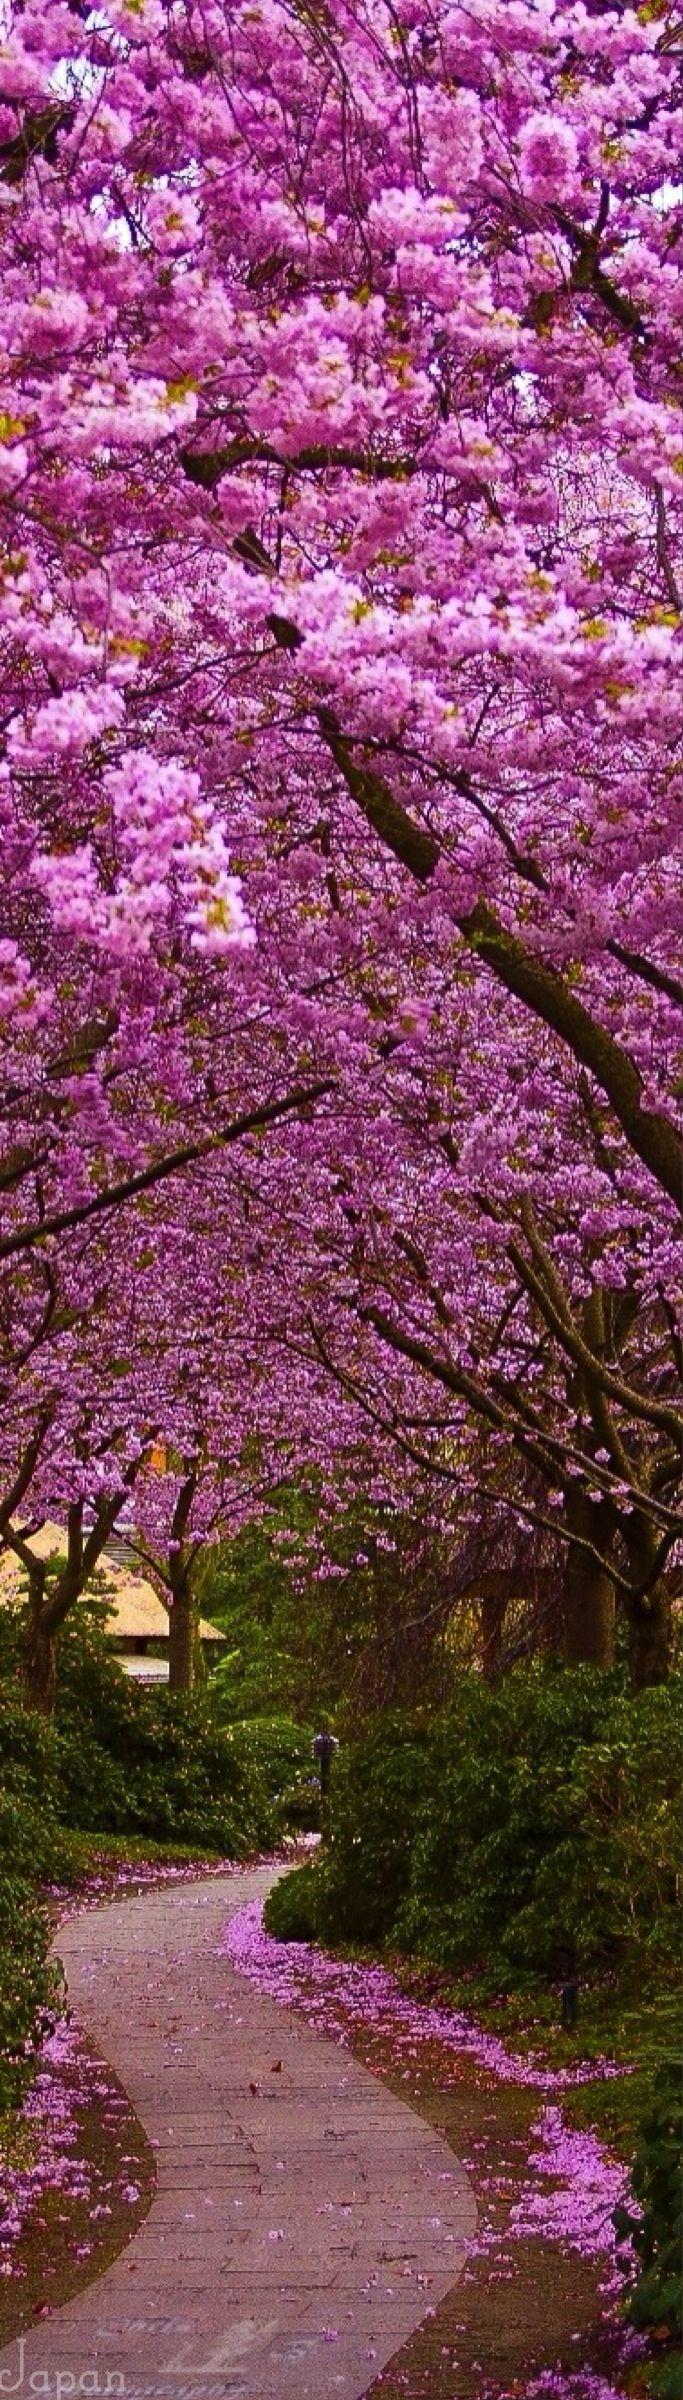 Japanese cherry blossoms _ ازهار الكرز اليابانية